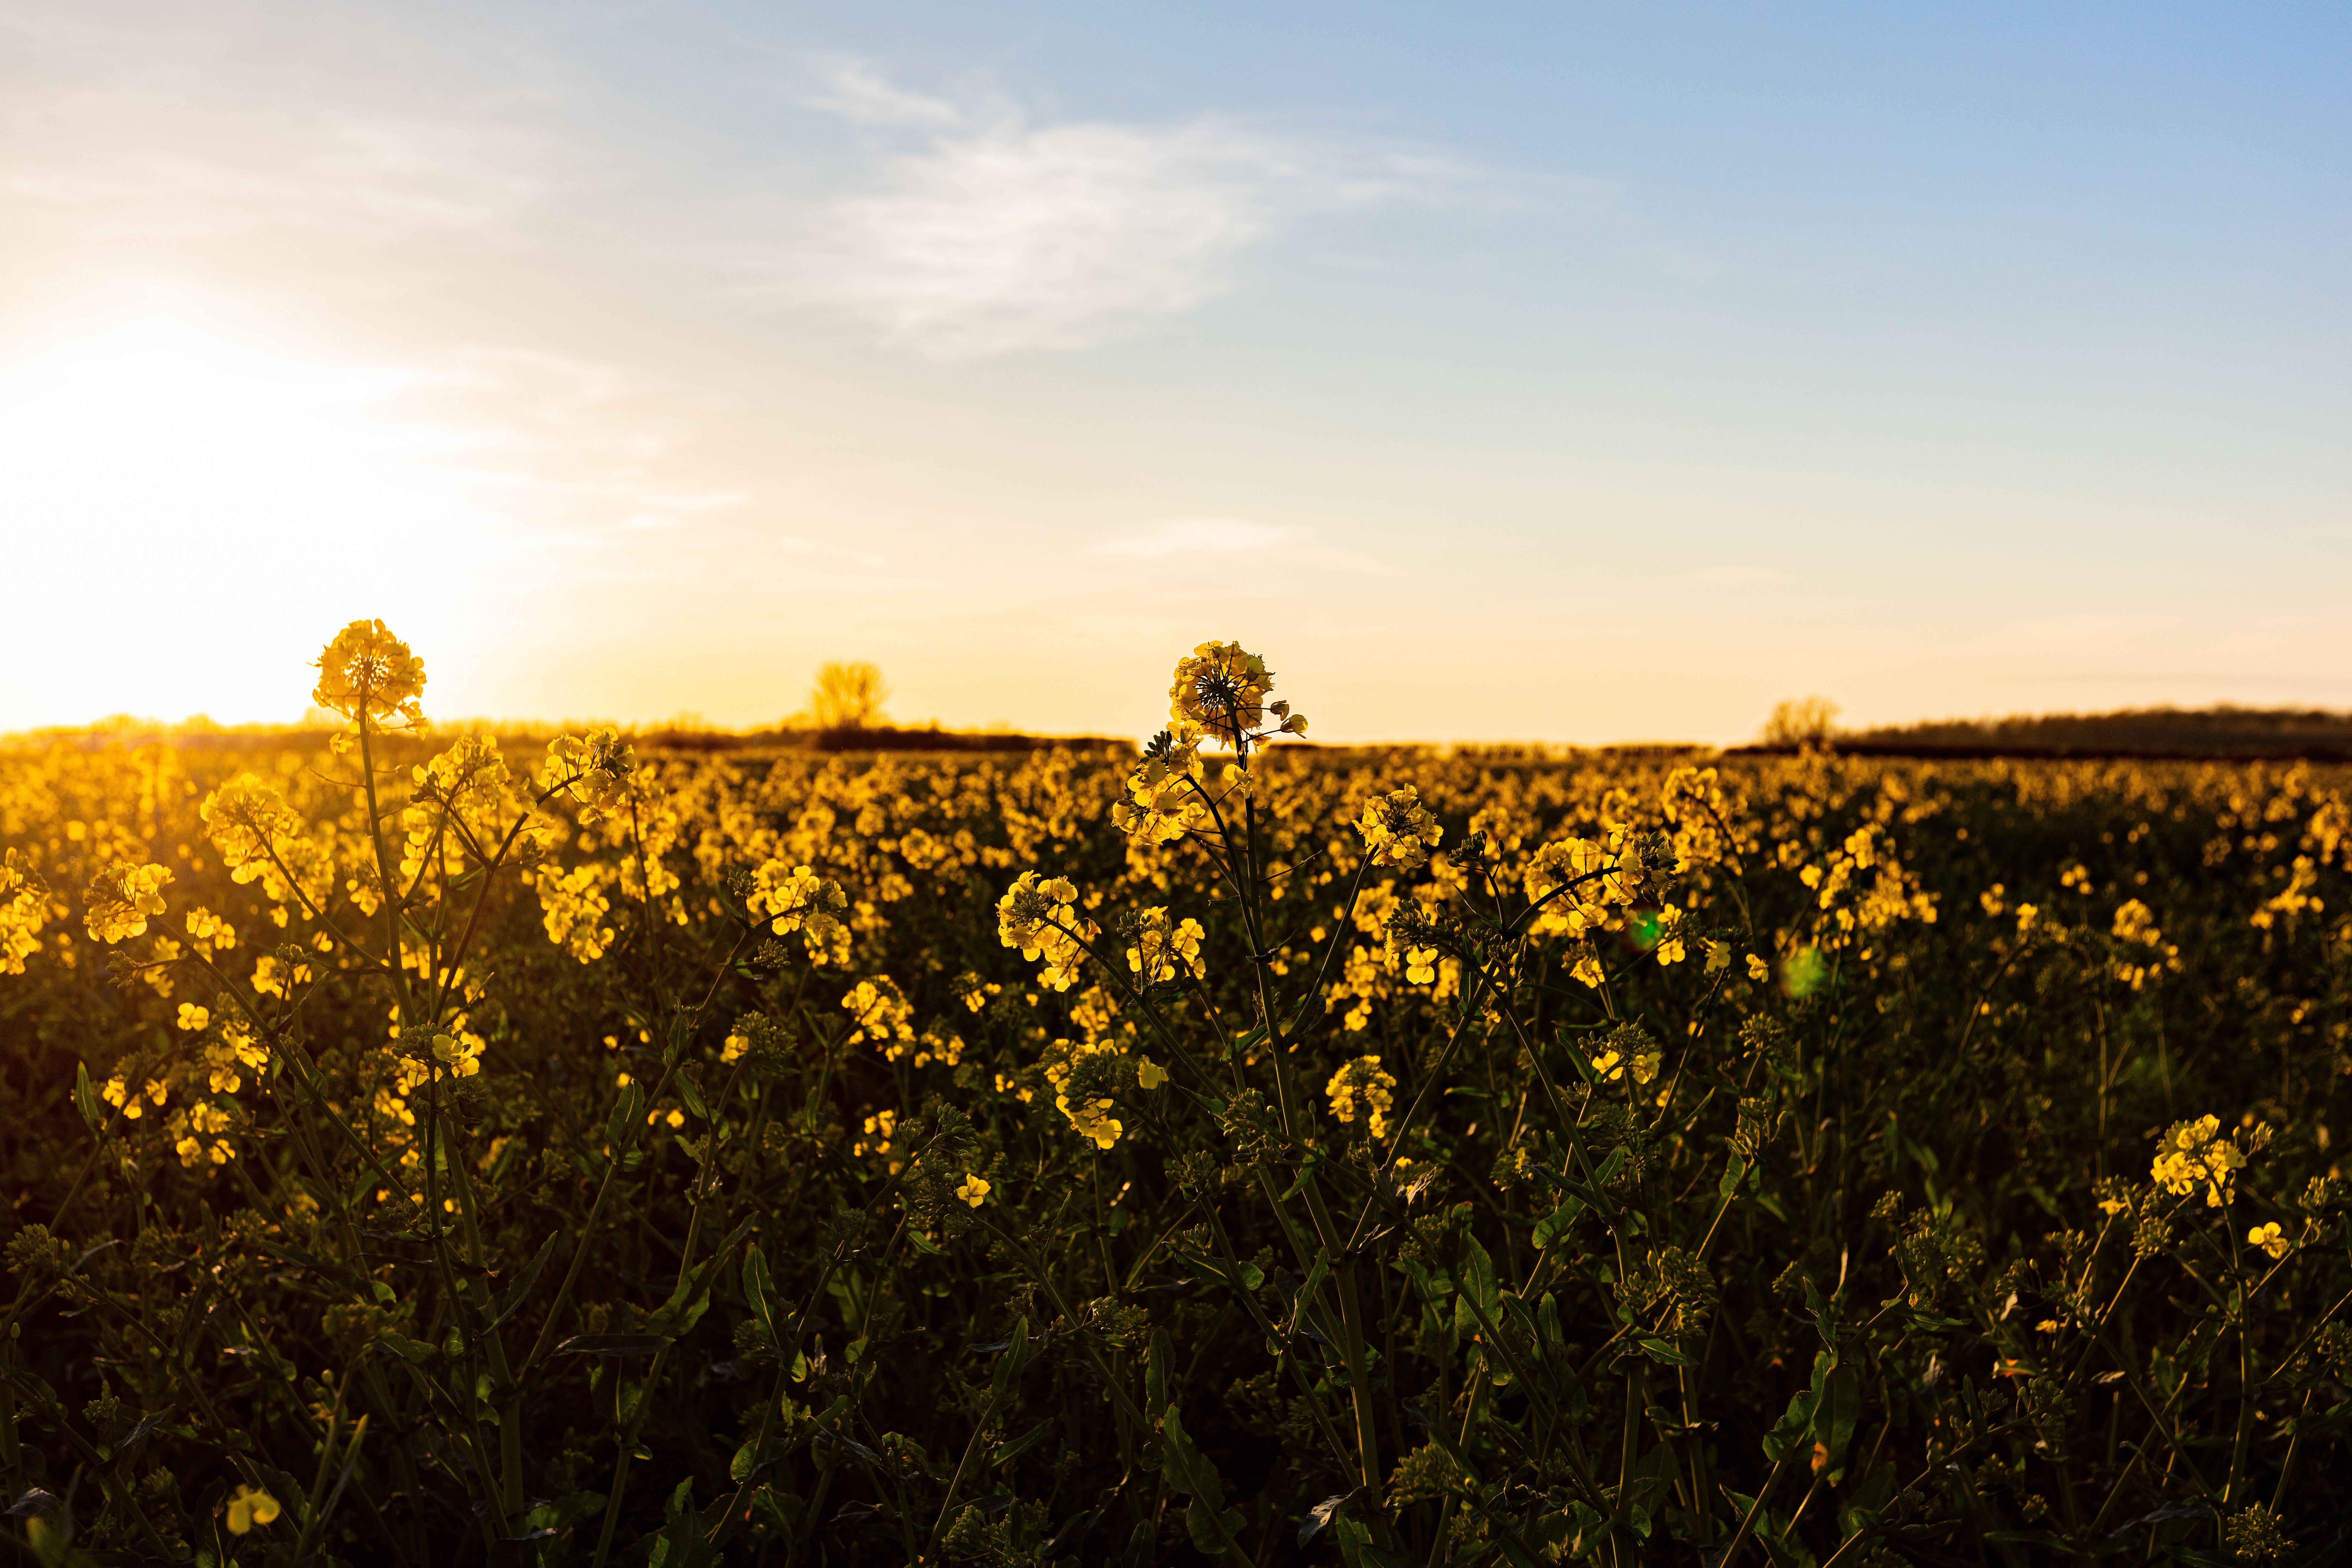 Early morninga walk through a rape seed oil field full of life and colour.